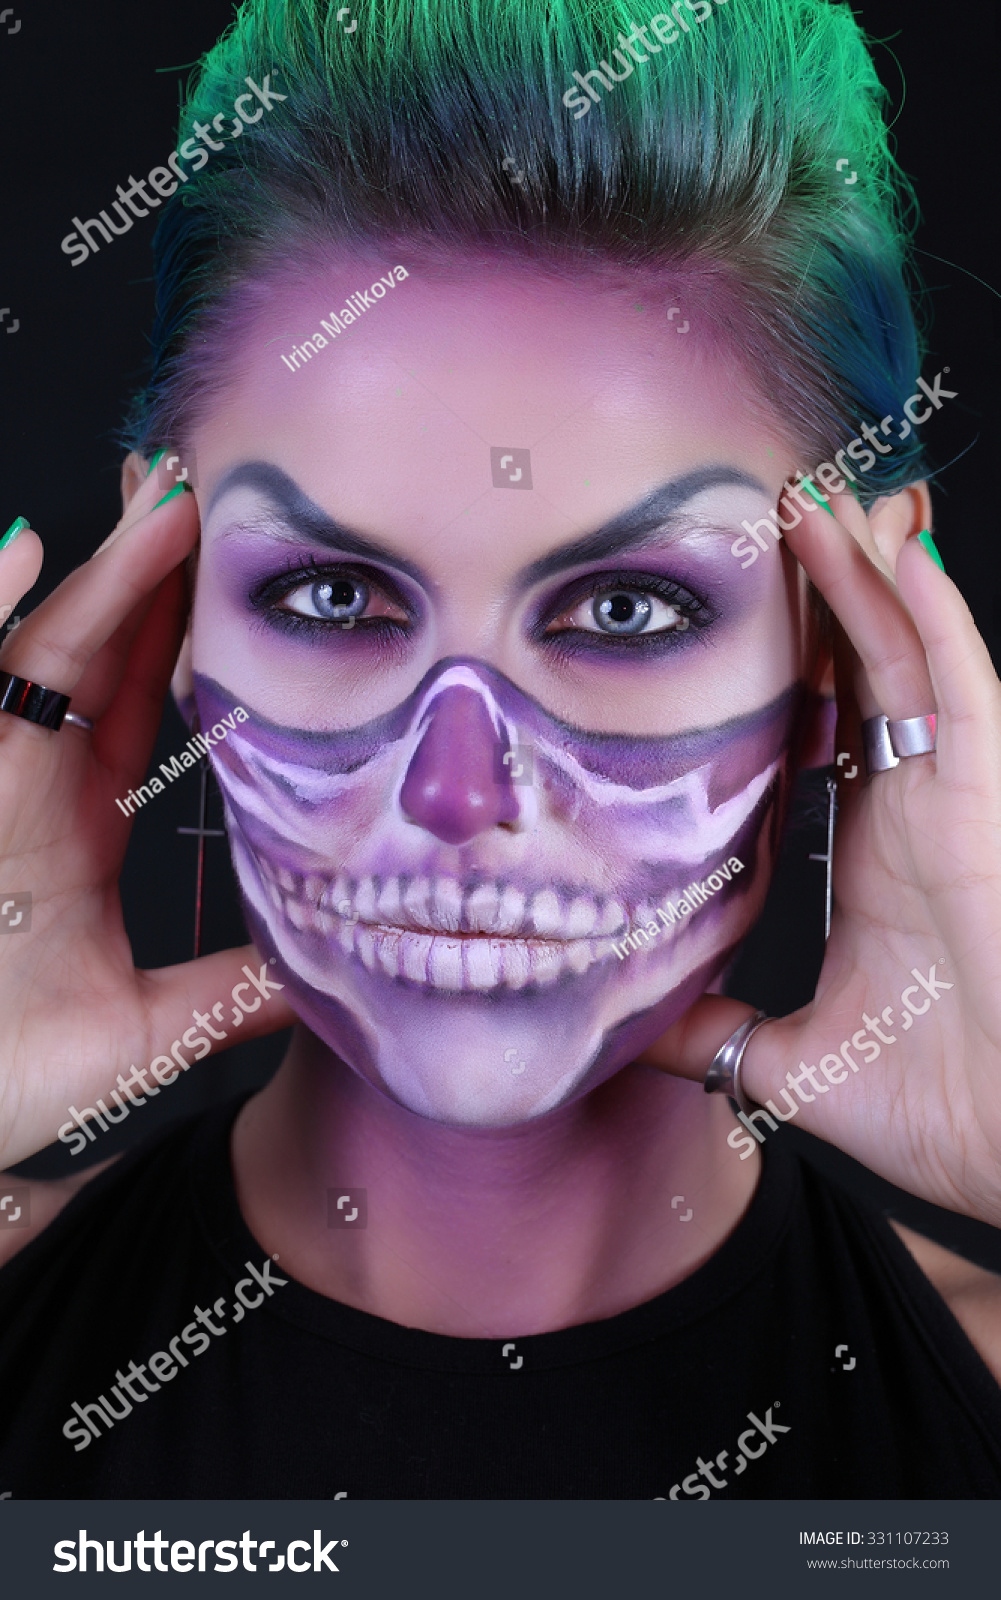 girl image zombie makeup halloween stock photo (edit now) 331107233